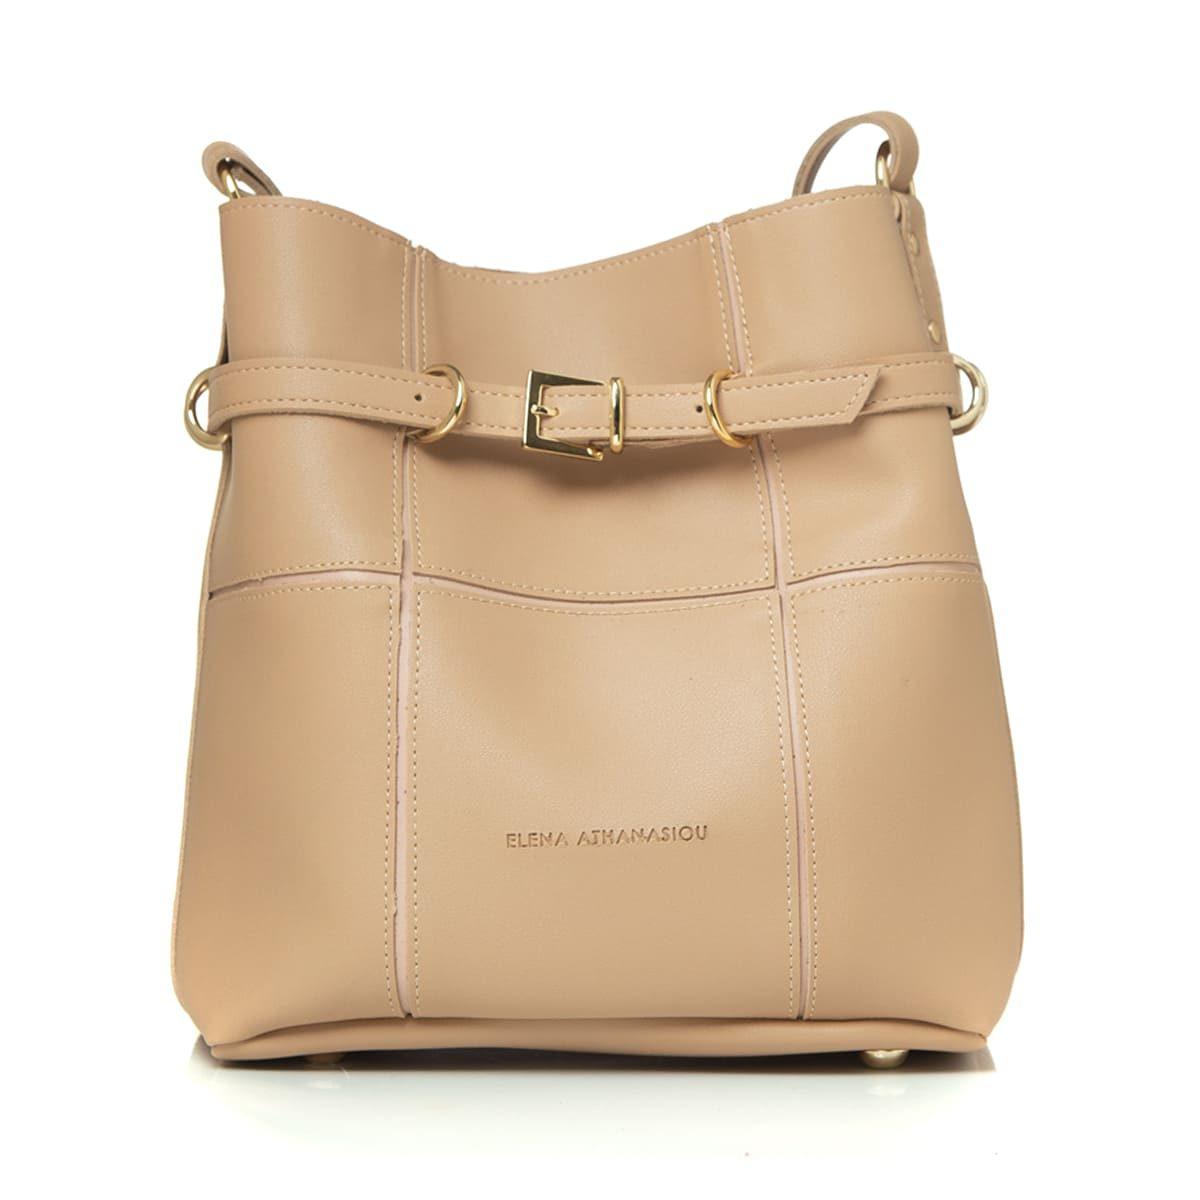 Elena Athanasiou Bags Puzzle Bag Vachetta L Size